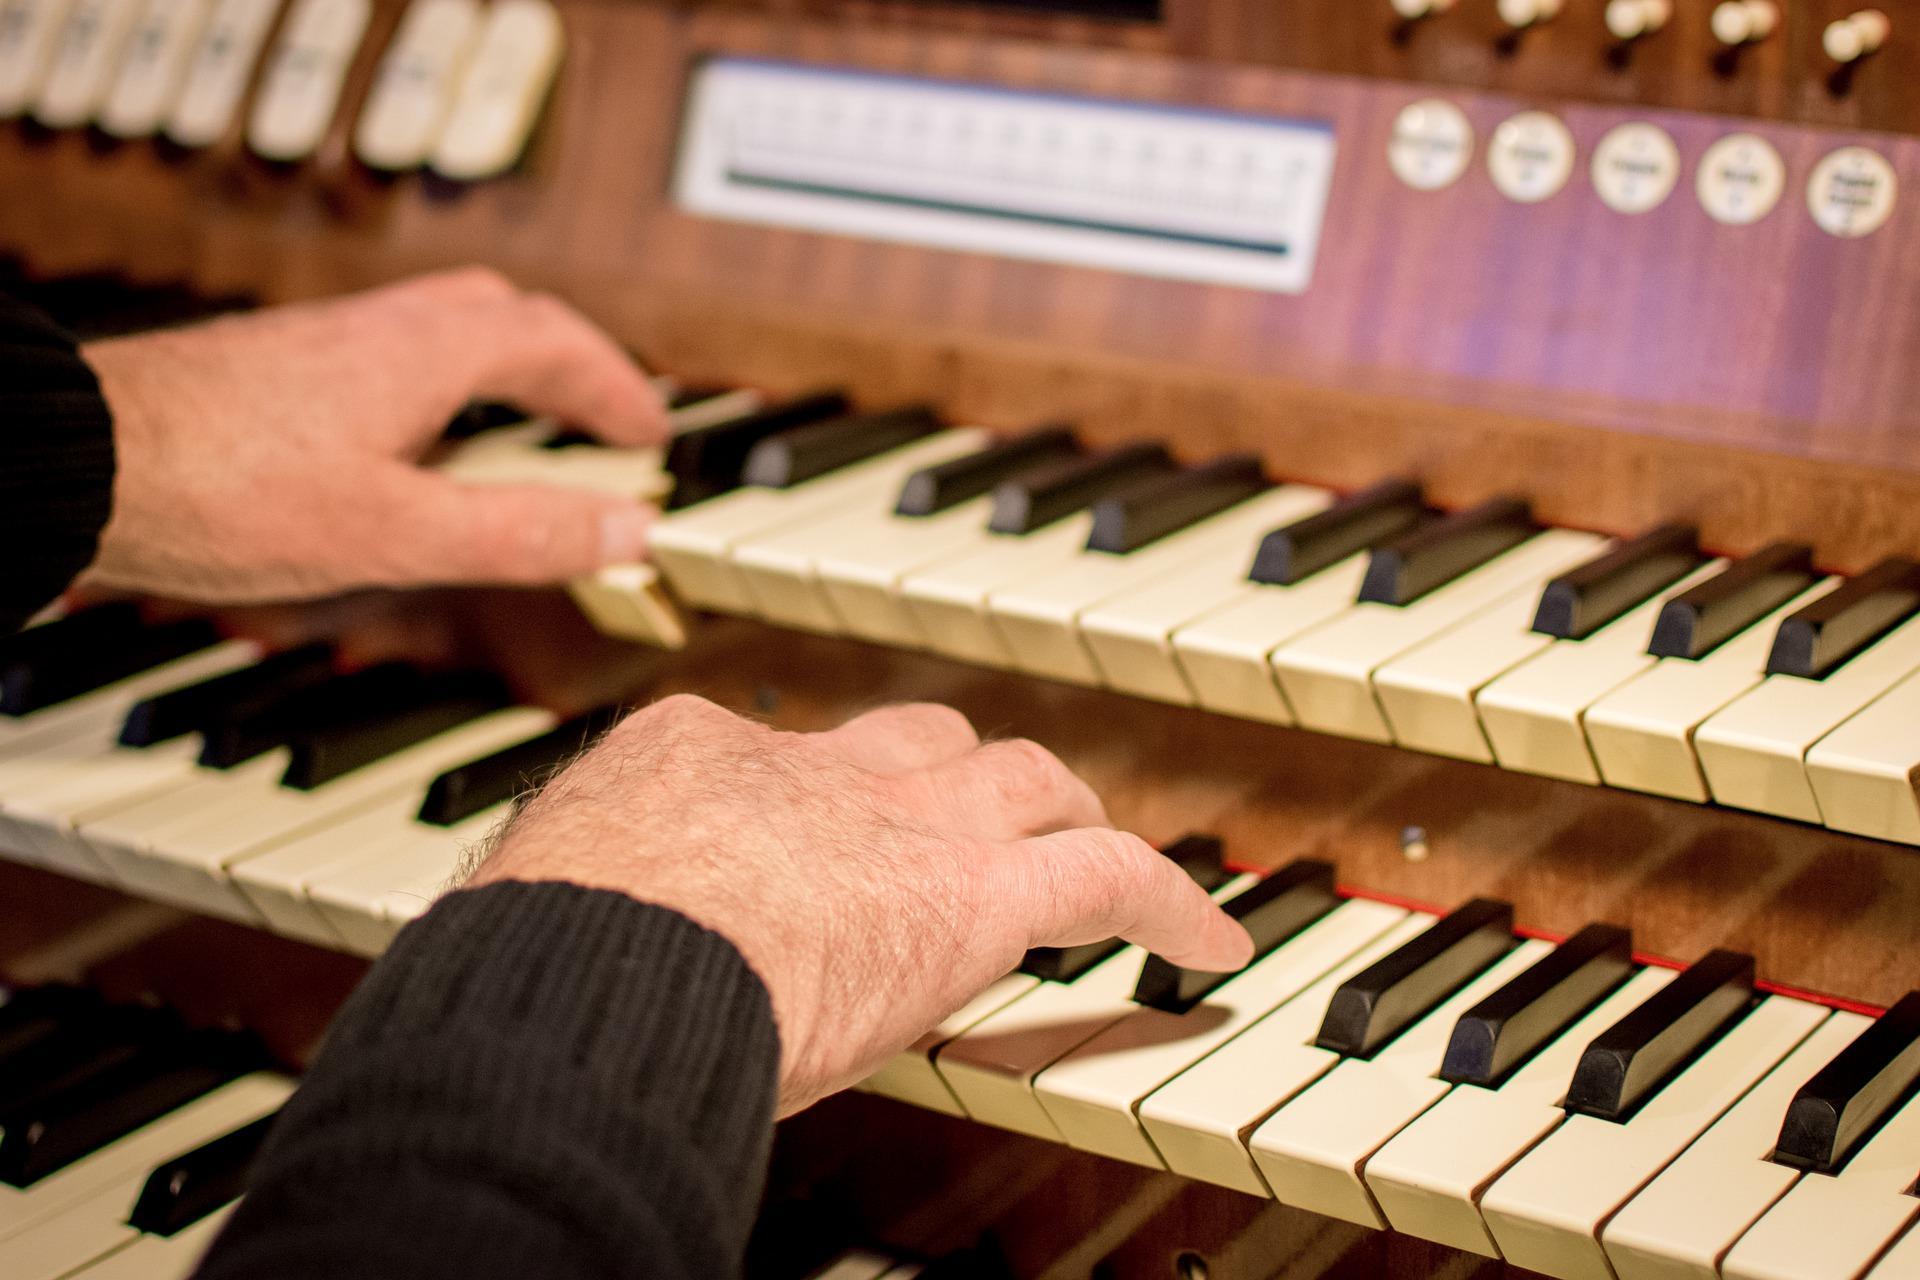 Orgel (c) www.pixabay.com